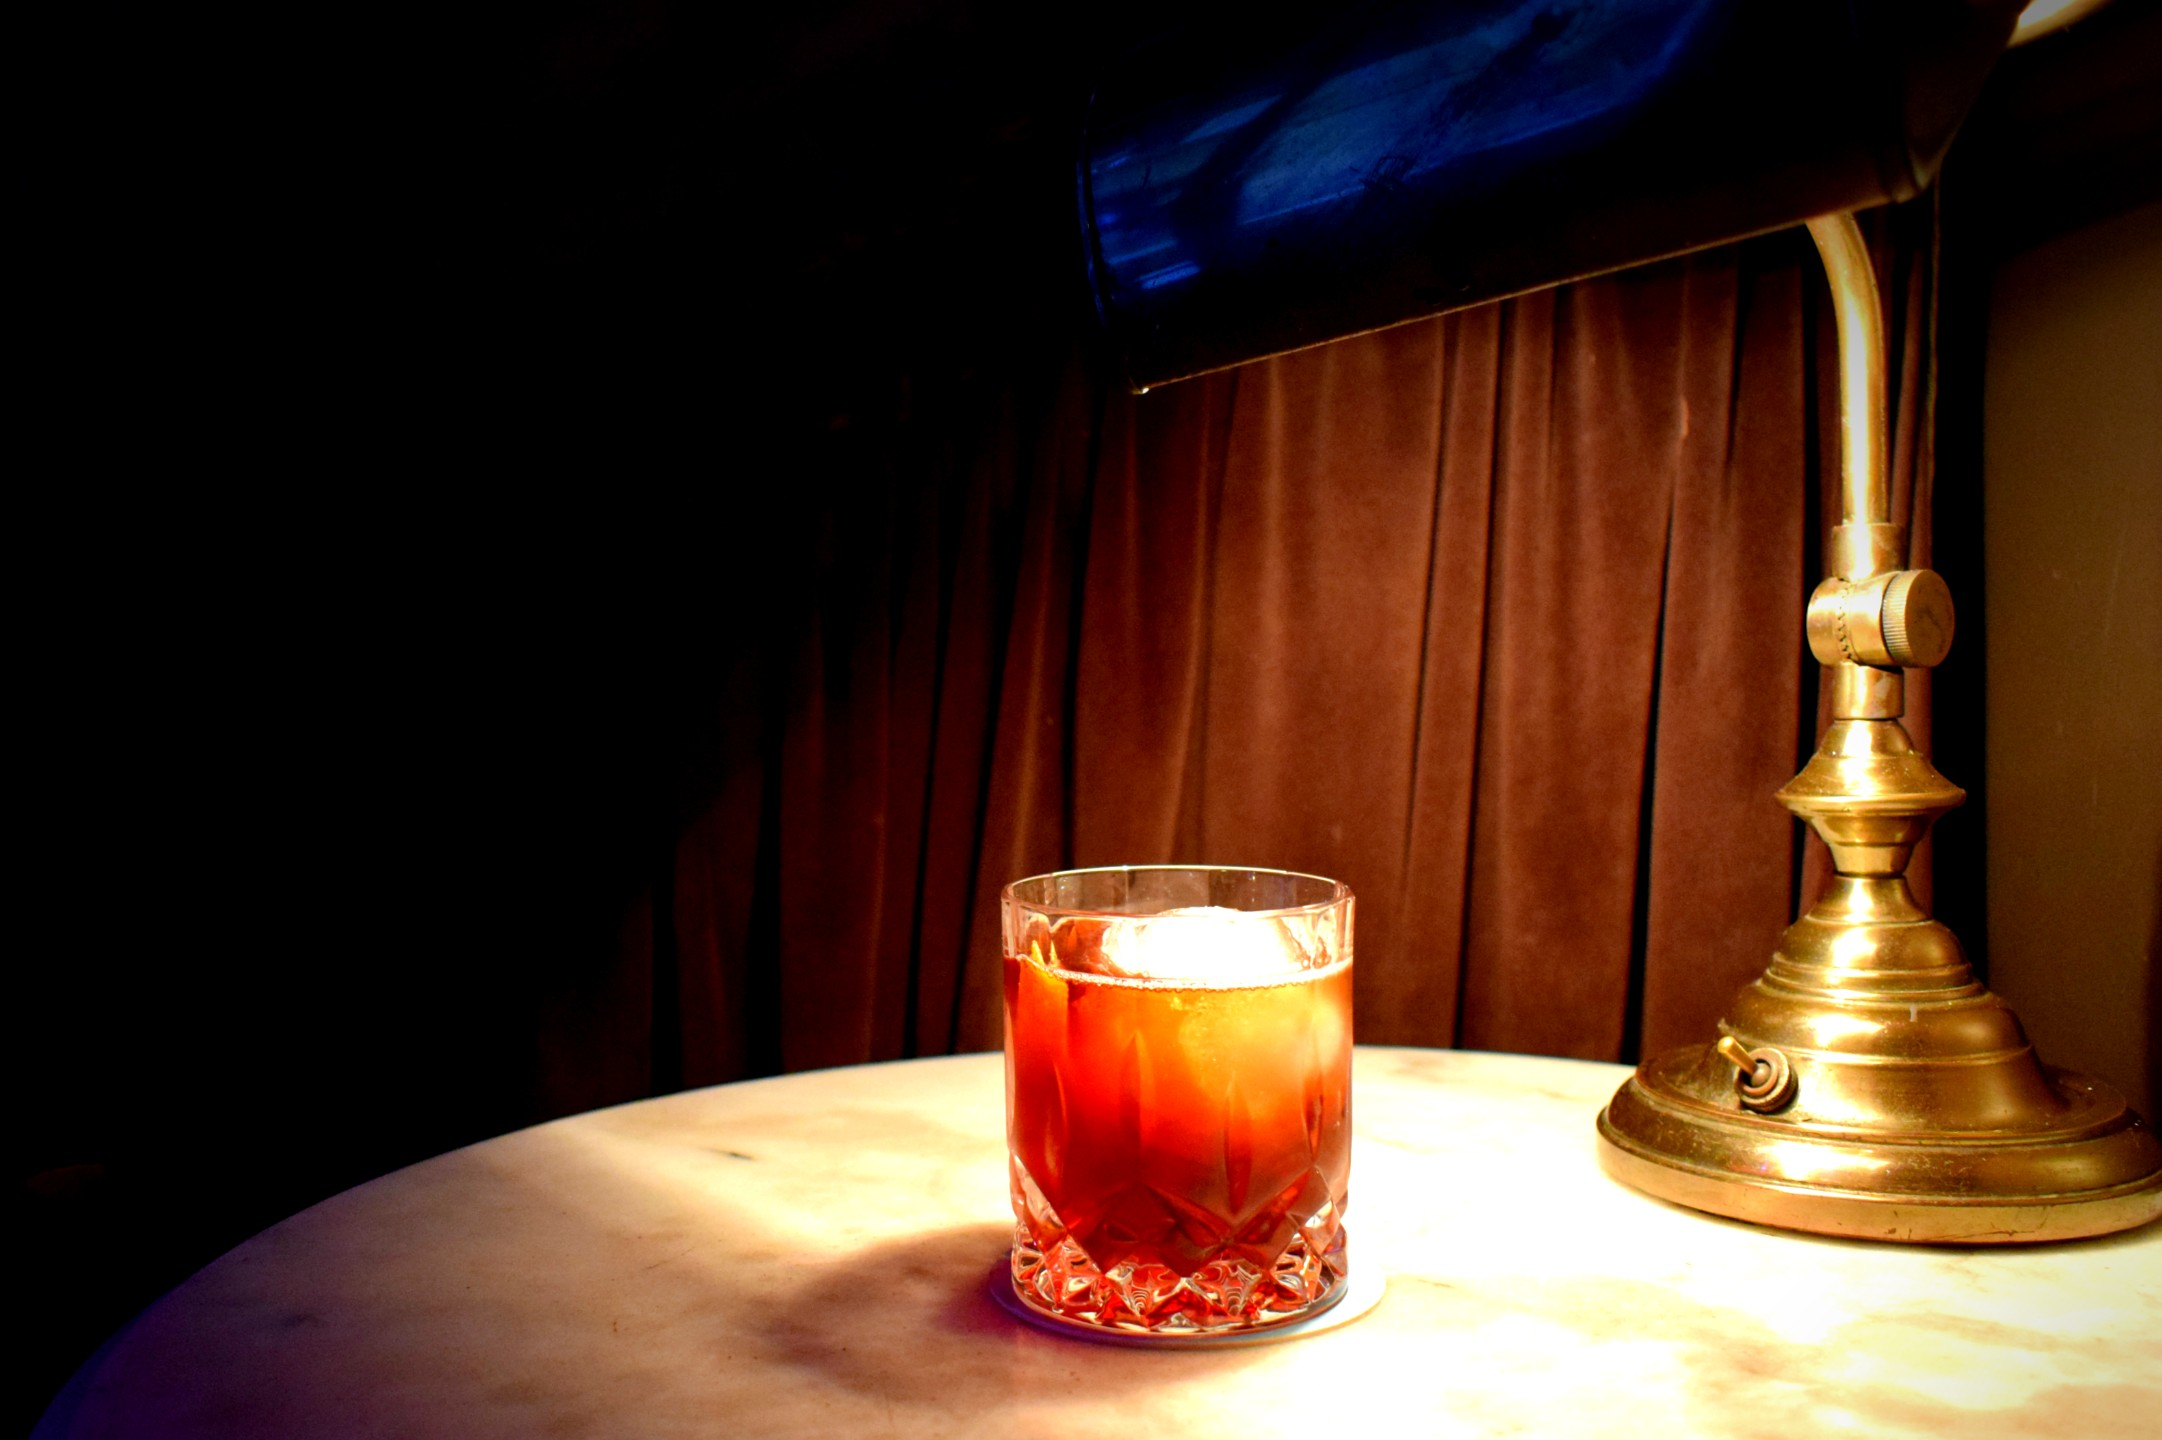 Collage Cocktail Bar, Born, Barcelona, by Ben Holbrook